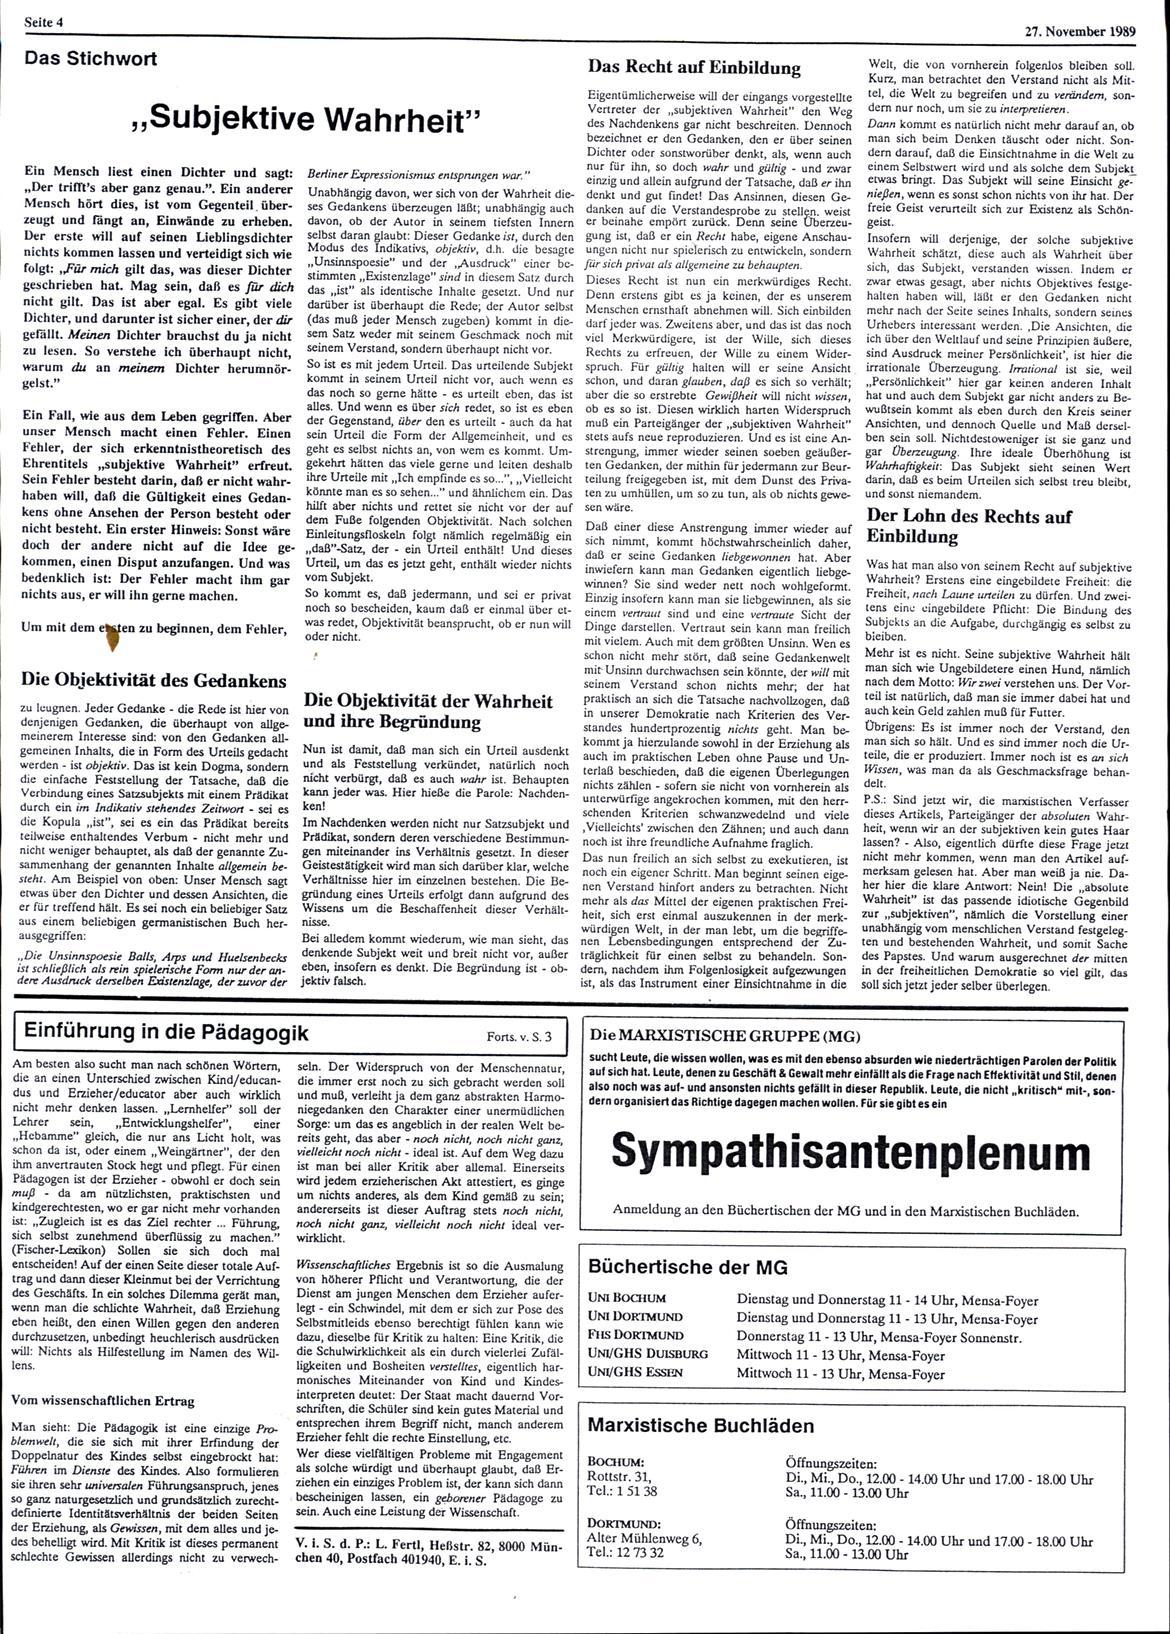 Bochum_BHZ_19891127_198_004